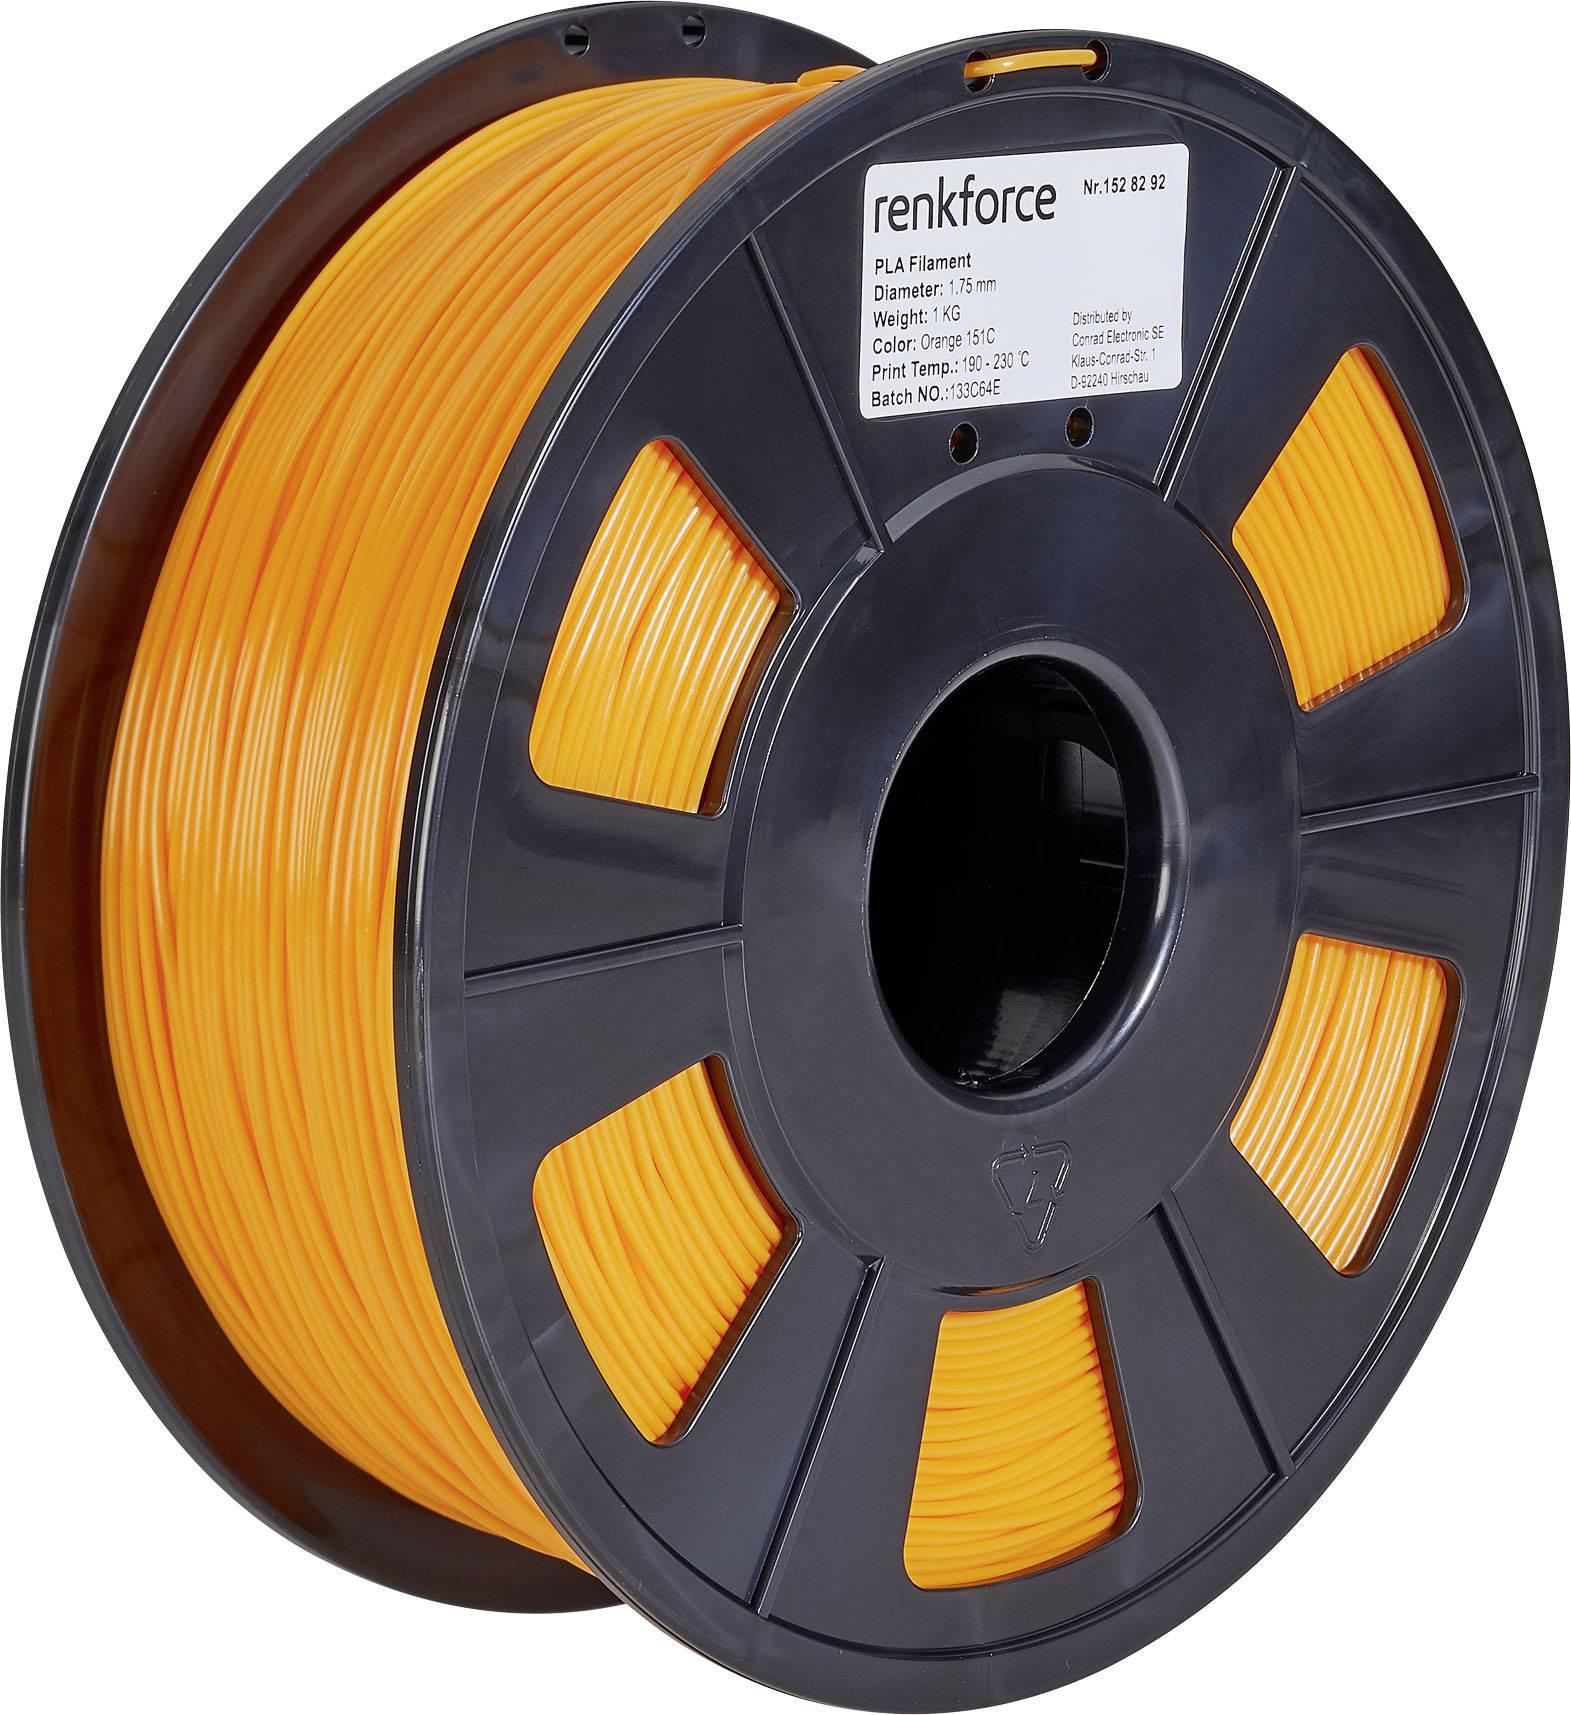 Vlákno pre 3Dtlačiarne, Renkforce 01.04.01.1111, PLA plast , 1.75 mm, 1 kg, oranžová